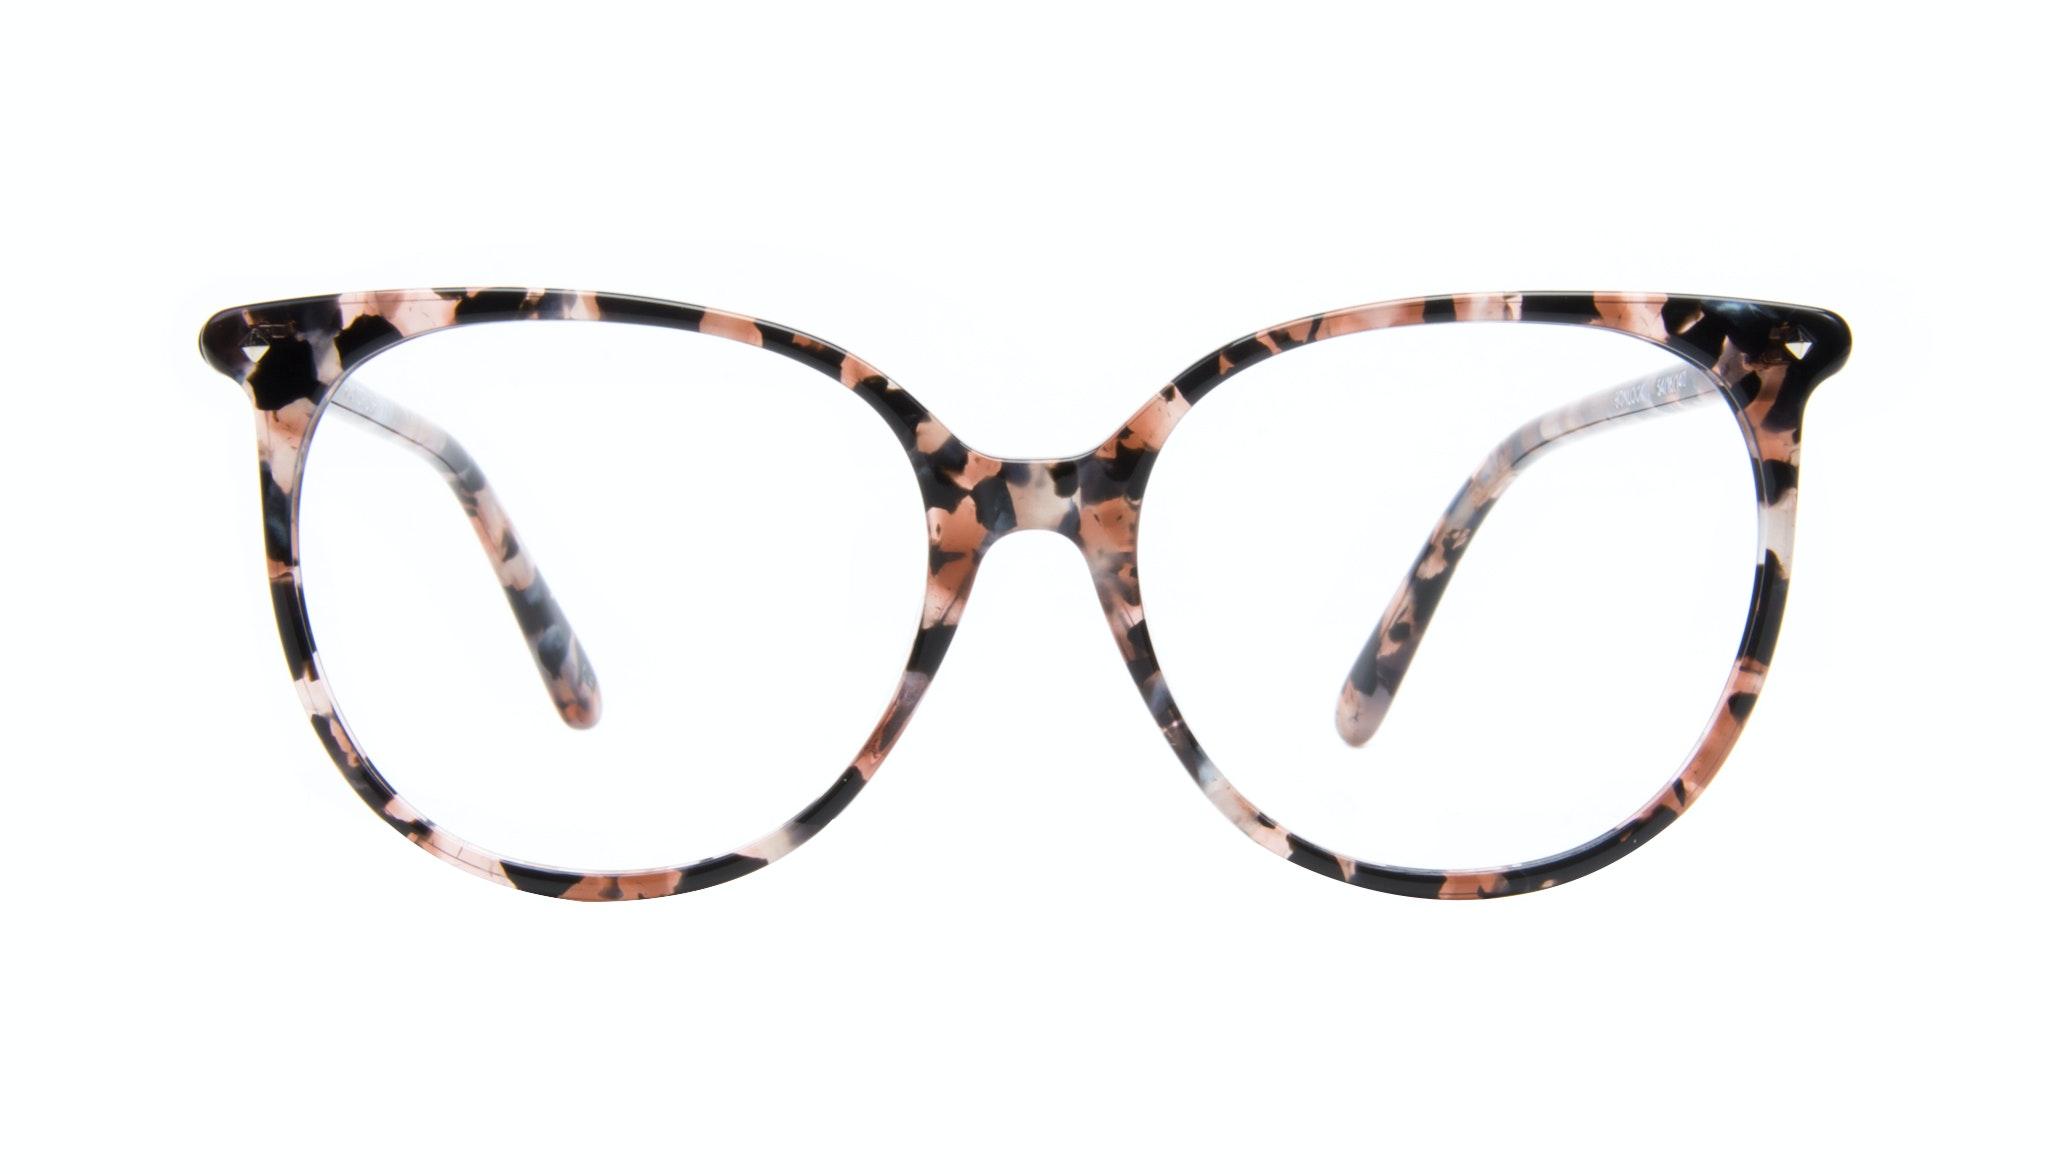 Affordable Fashion Glasses Cat Eye Square Eyeglasses Women Area Pink Tortoise Front